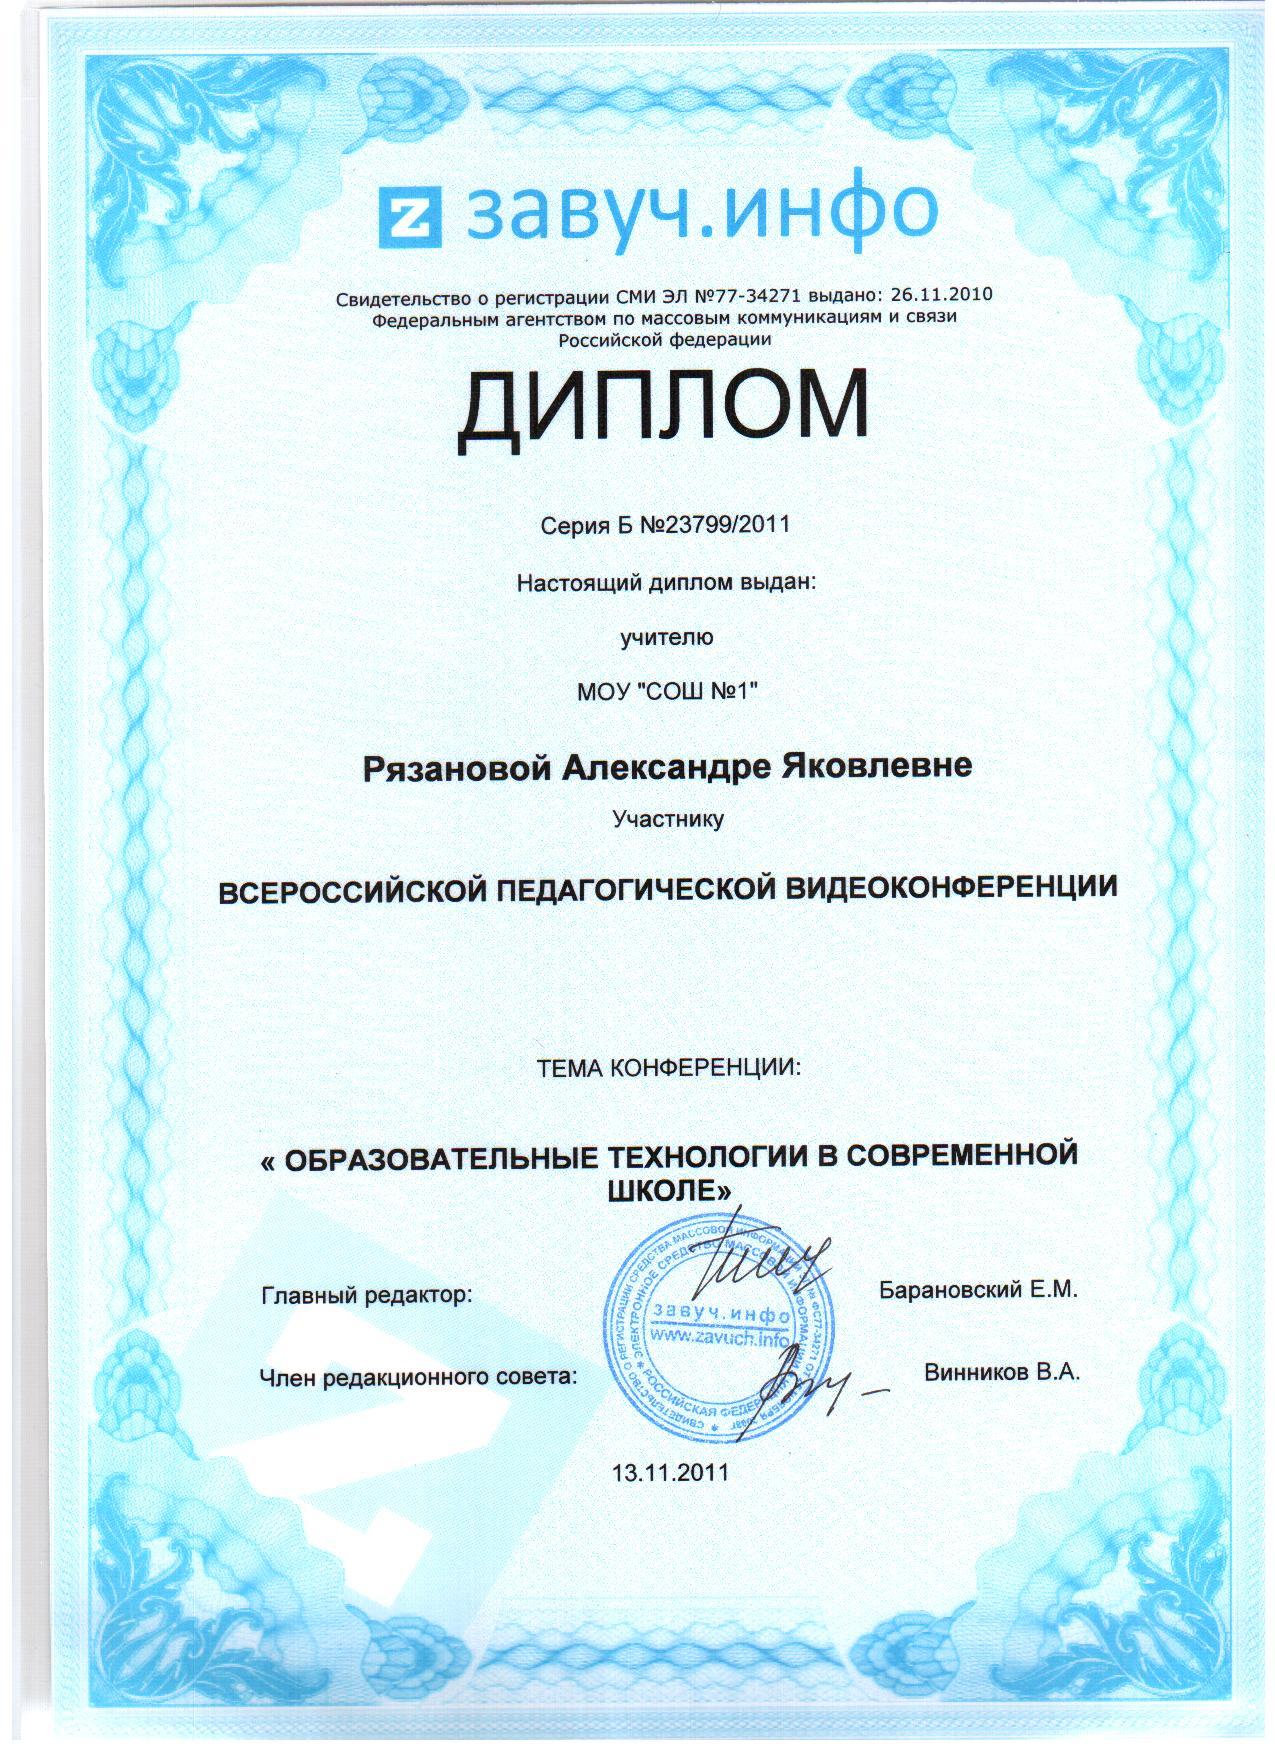 C:\Documents and Settings\Admin\Рабочий стол\грамоты\26.jpg